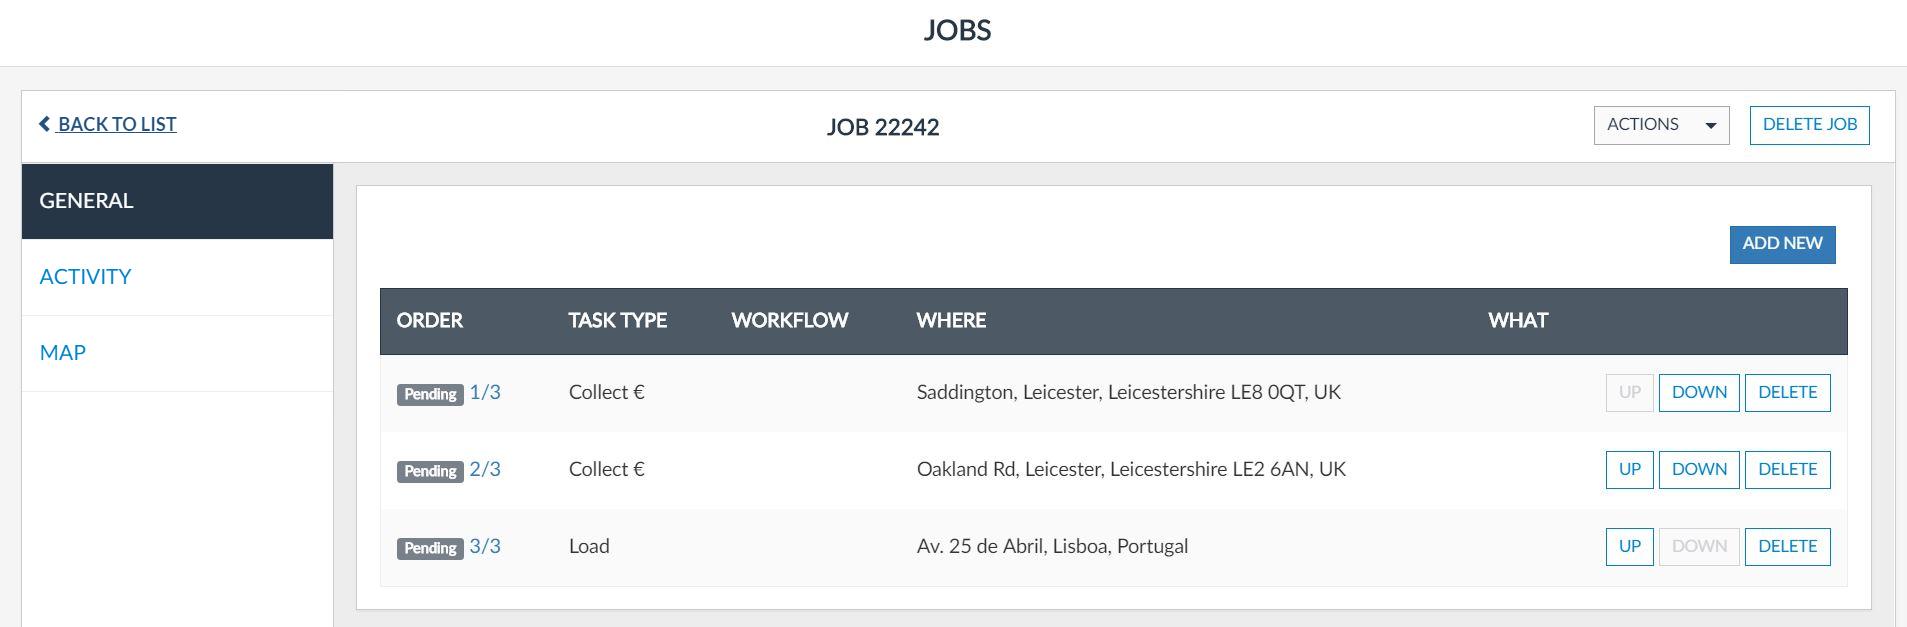 Jobs  How To Delete A Job?